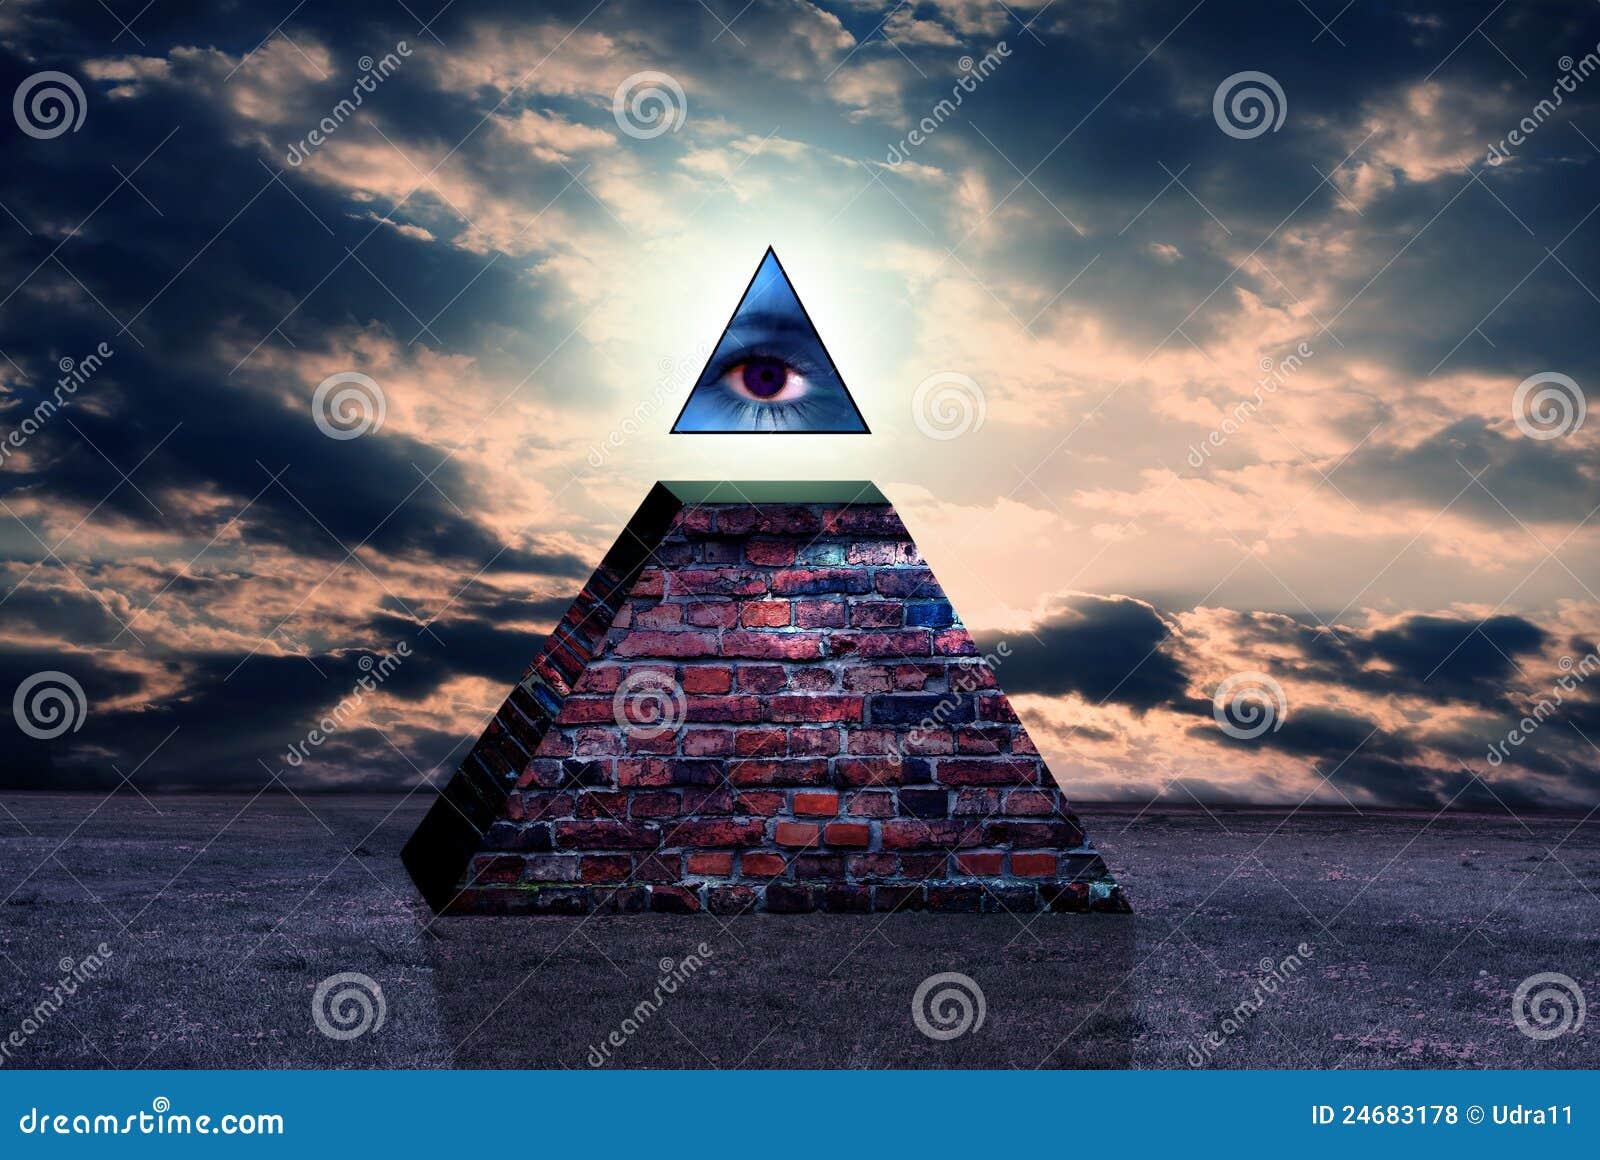 Nueva muestra del orden mundial del illuminati